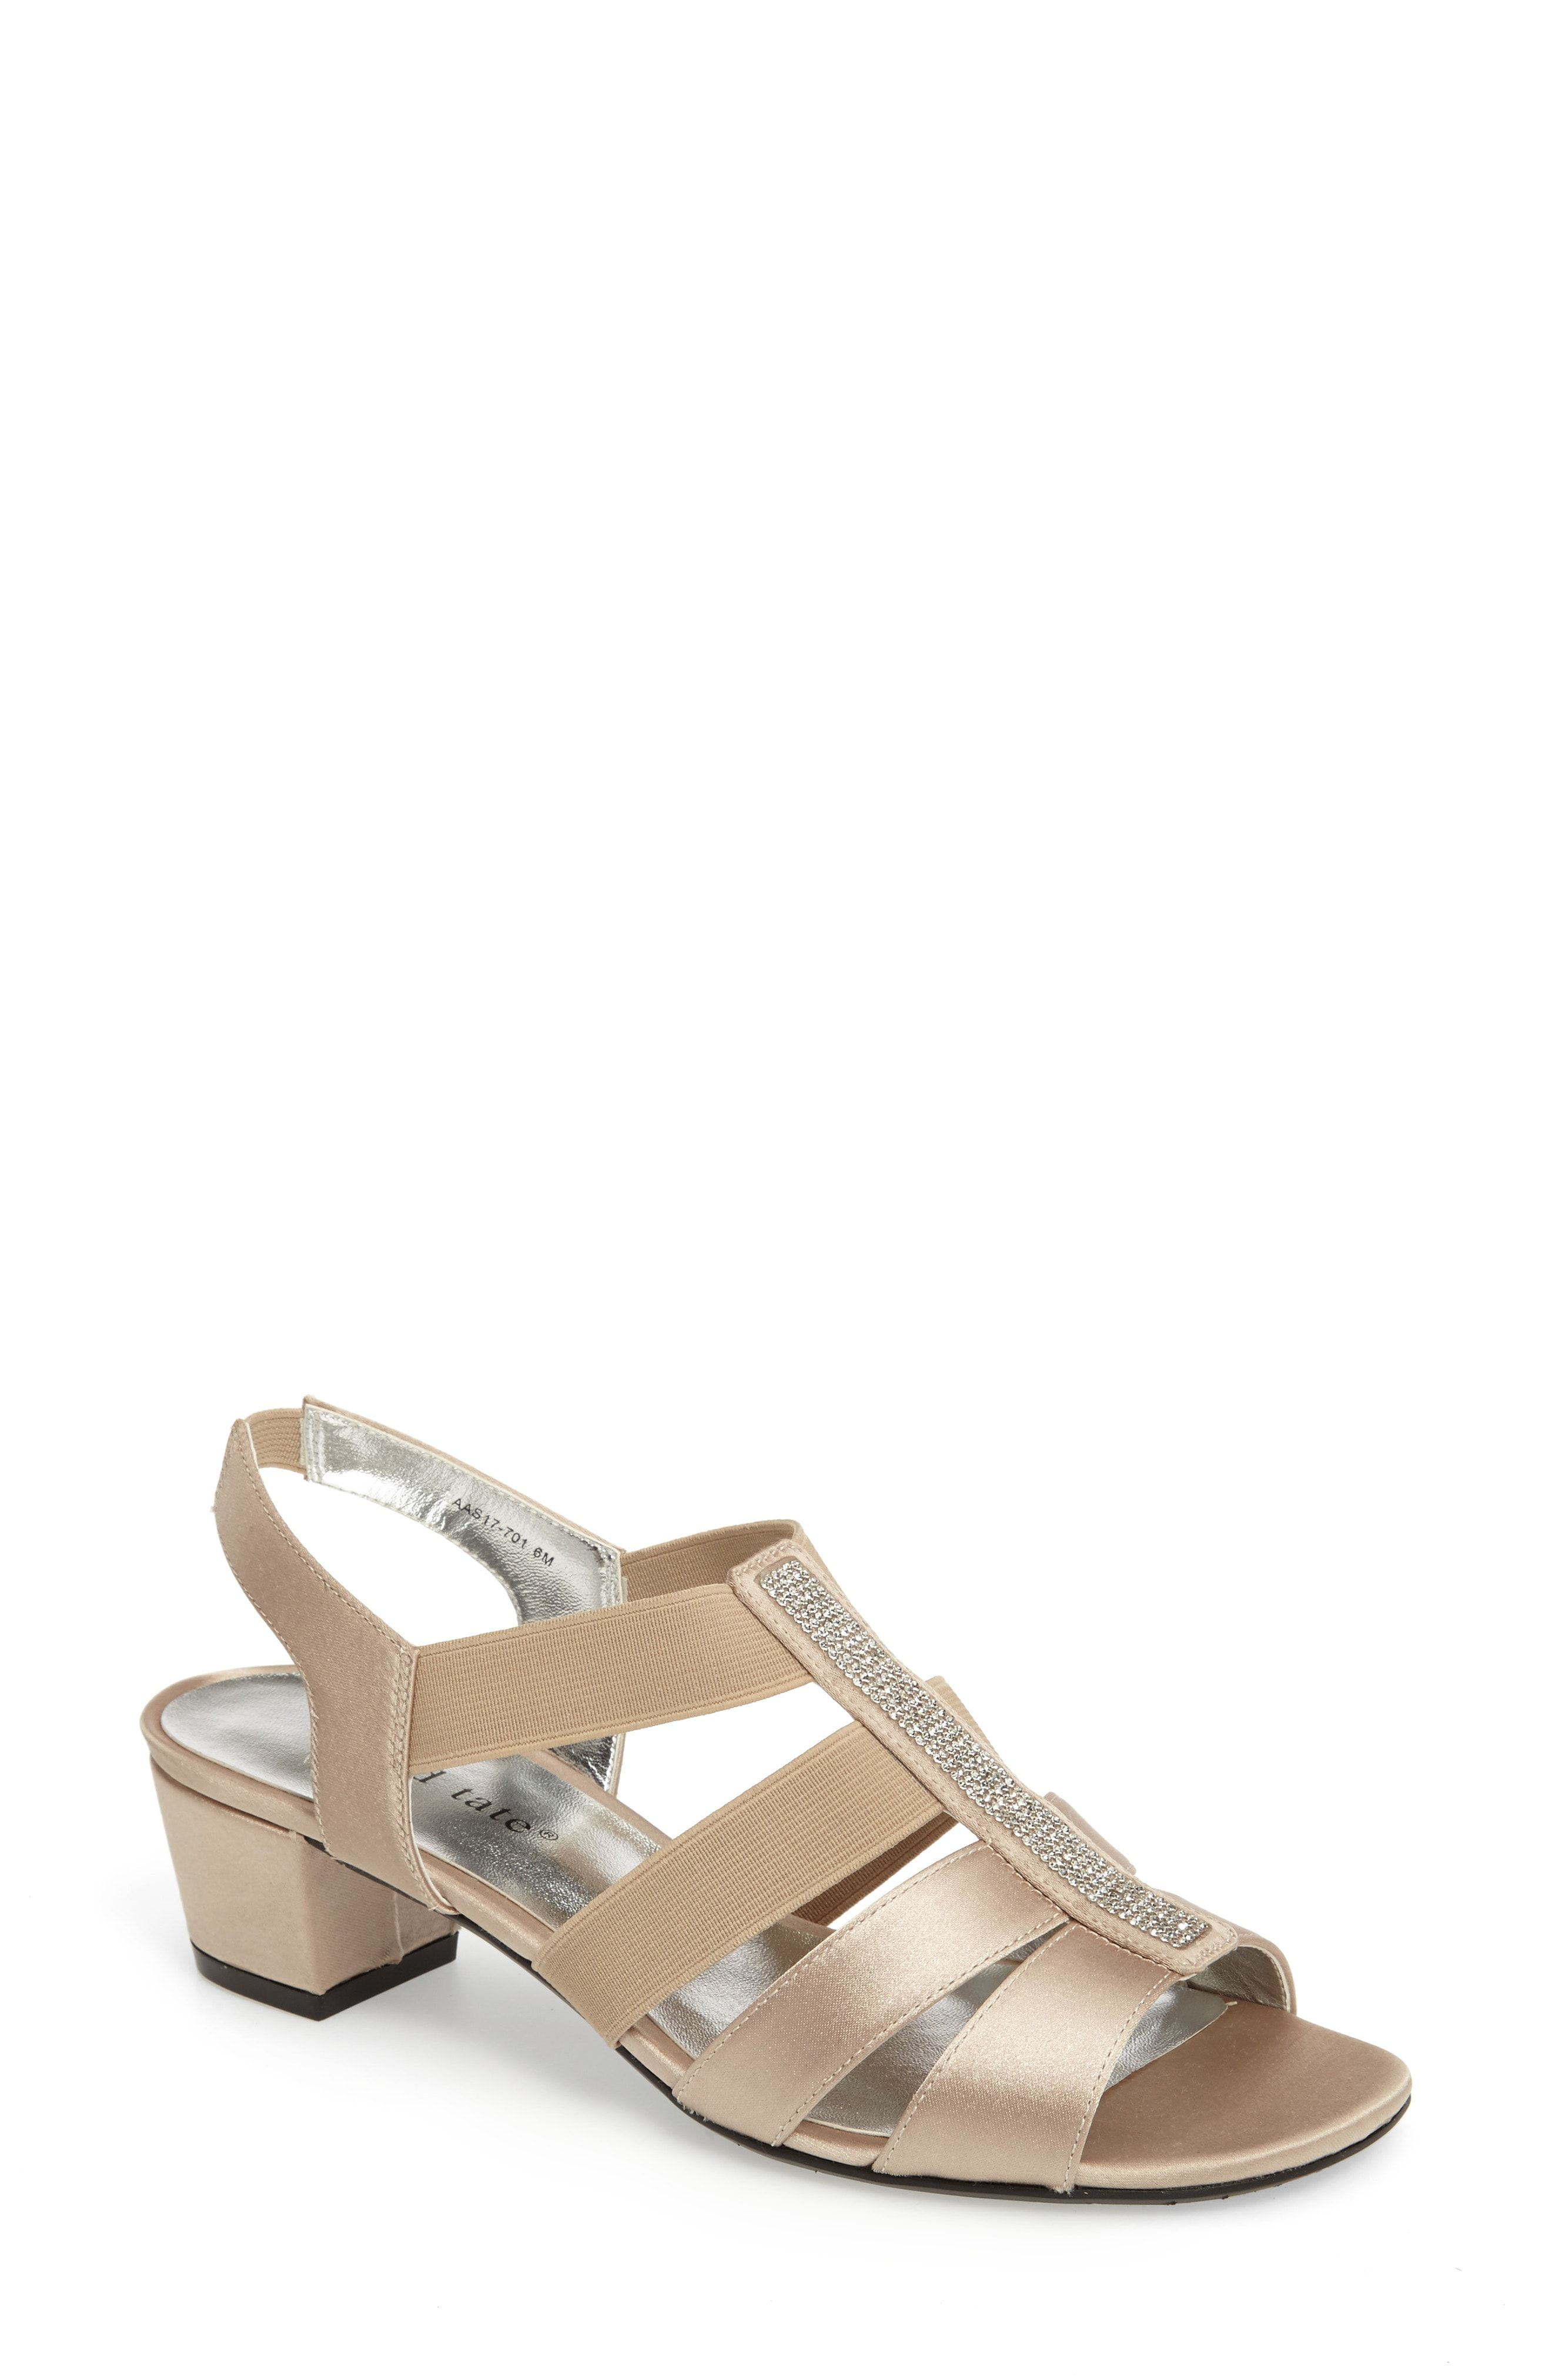 873e3e754dd 12 Most Comfortable Wedding Shoes